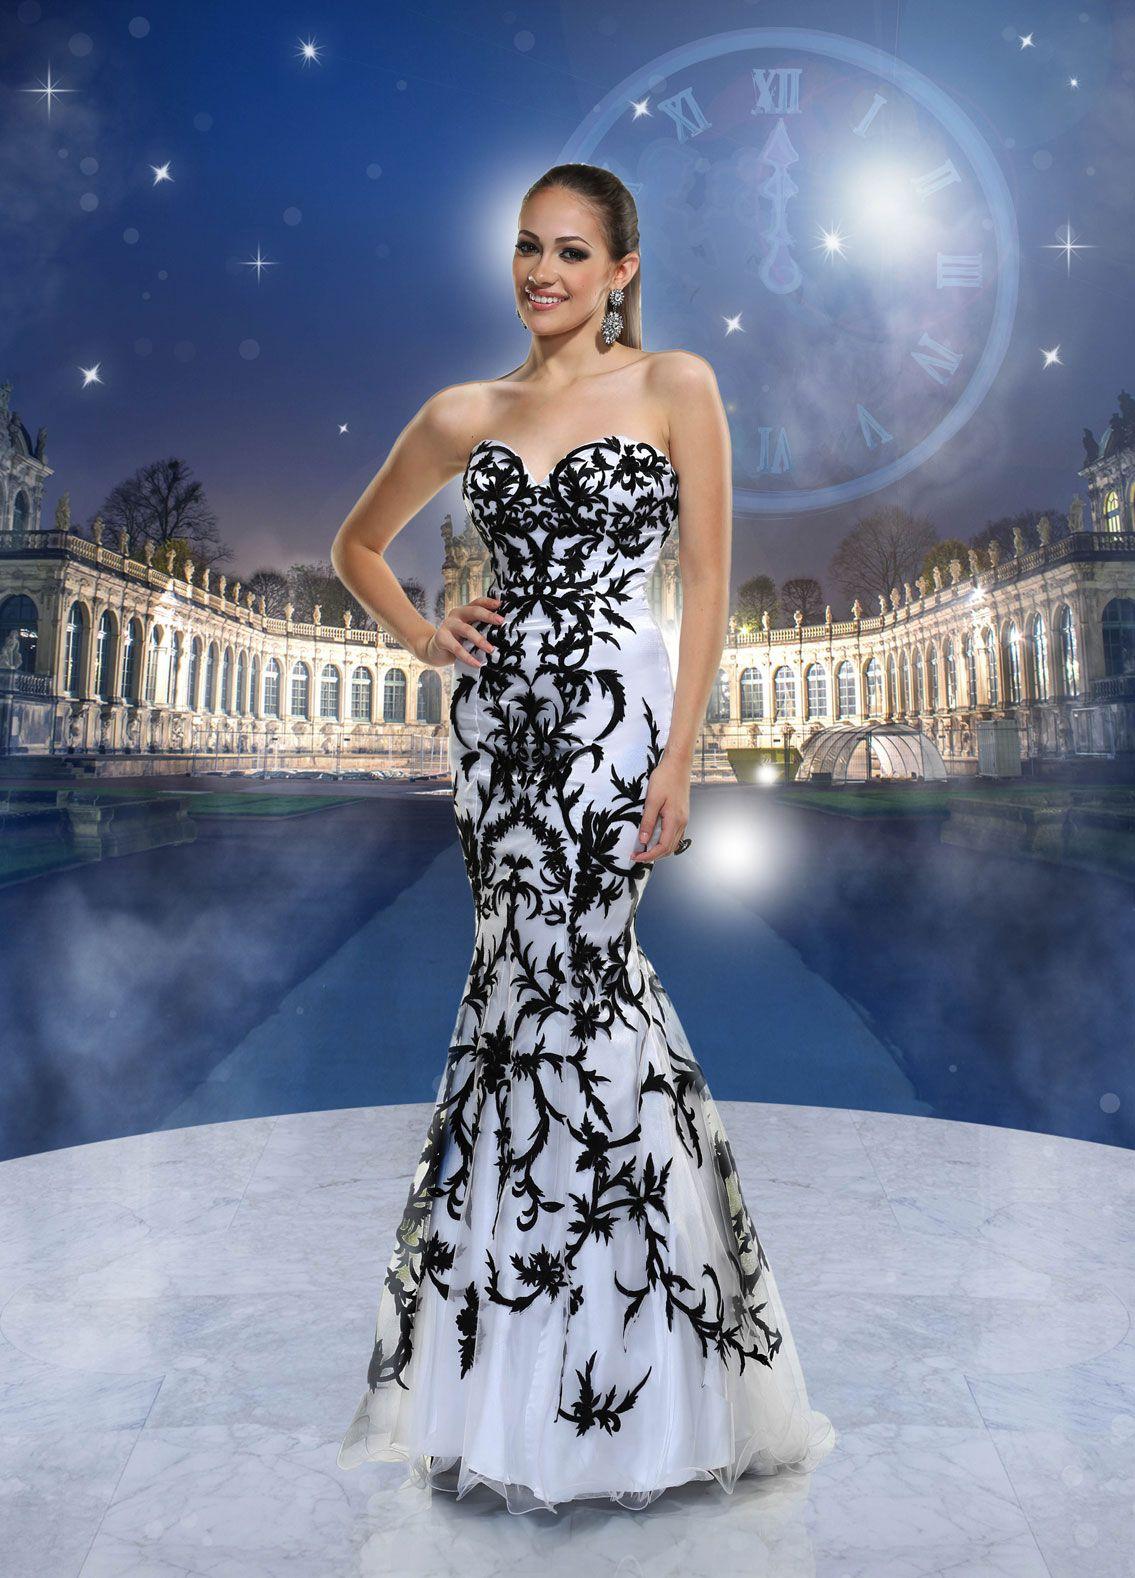 Disney Forever Enchanted Prom Dresses Black White Wedding Dress Stunning Dresses Prom Dresses